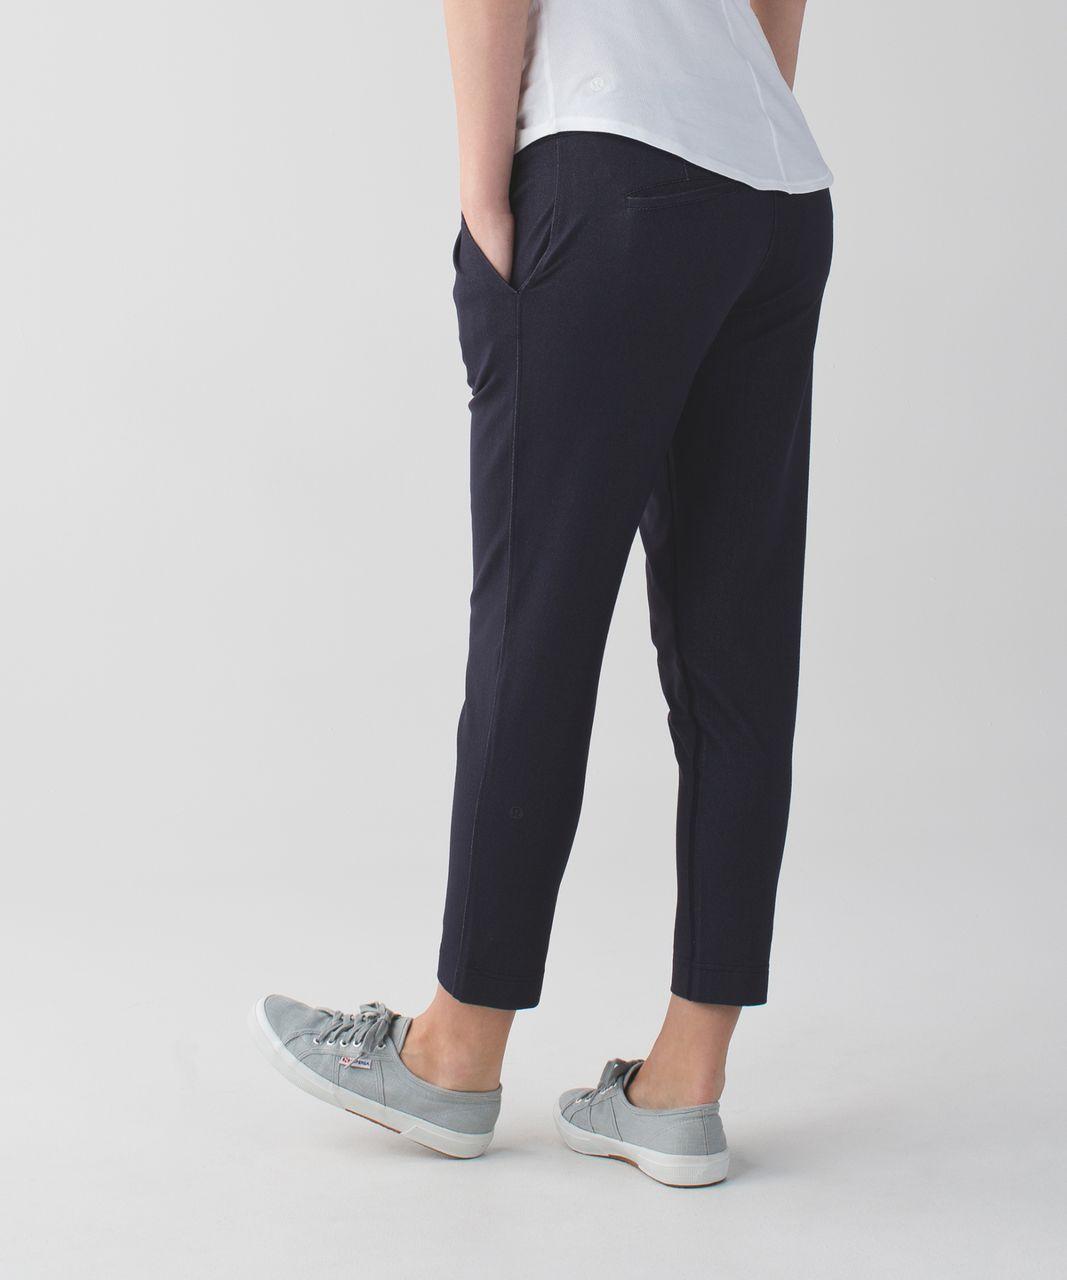 Lululemon Jet Crop (Slim) *Luon - Denim Luon Naval Blue